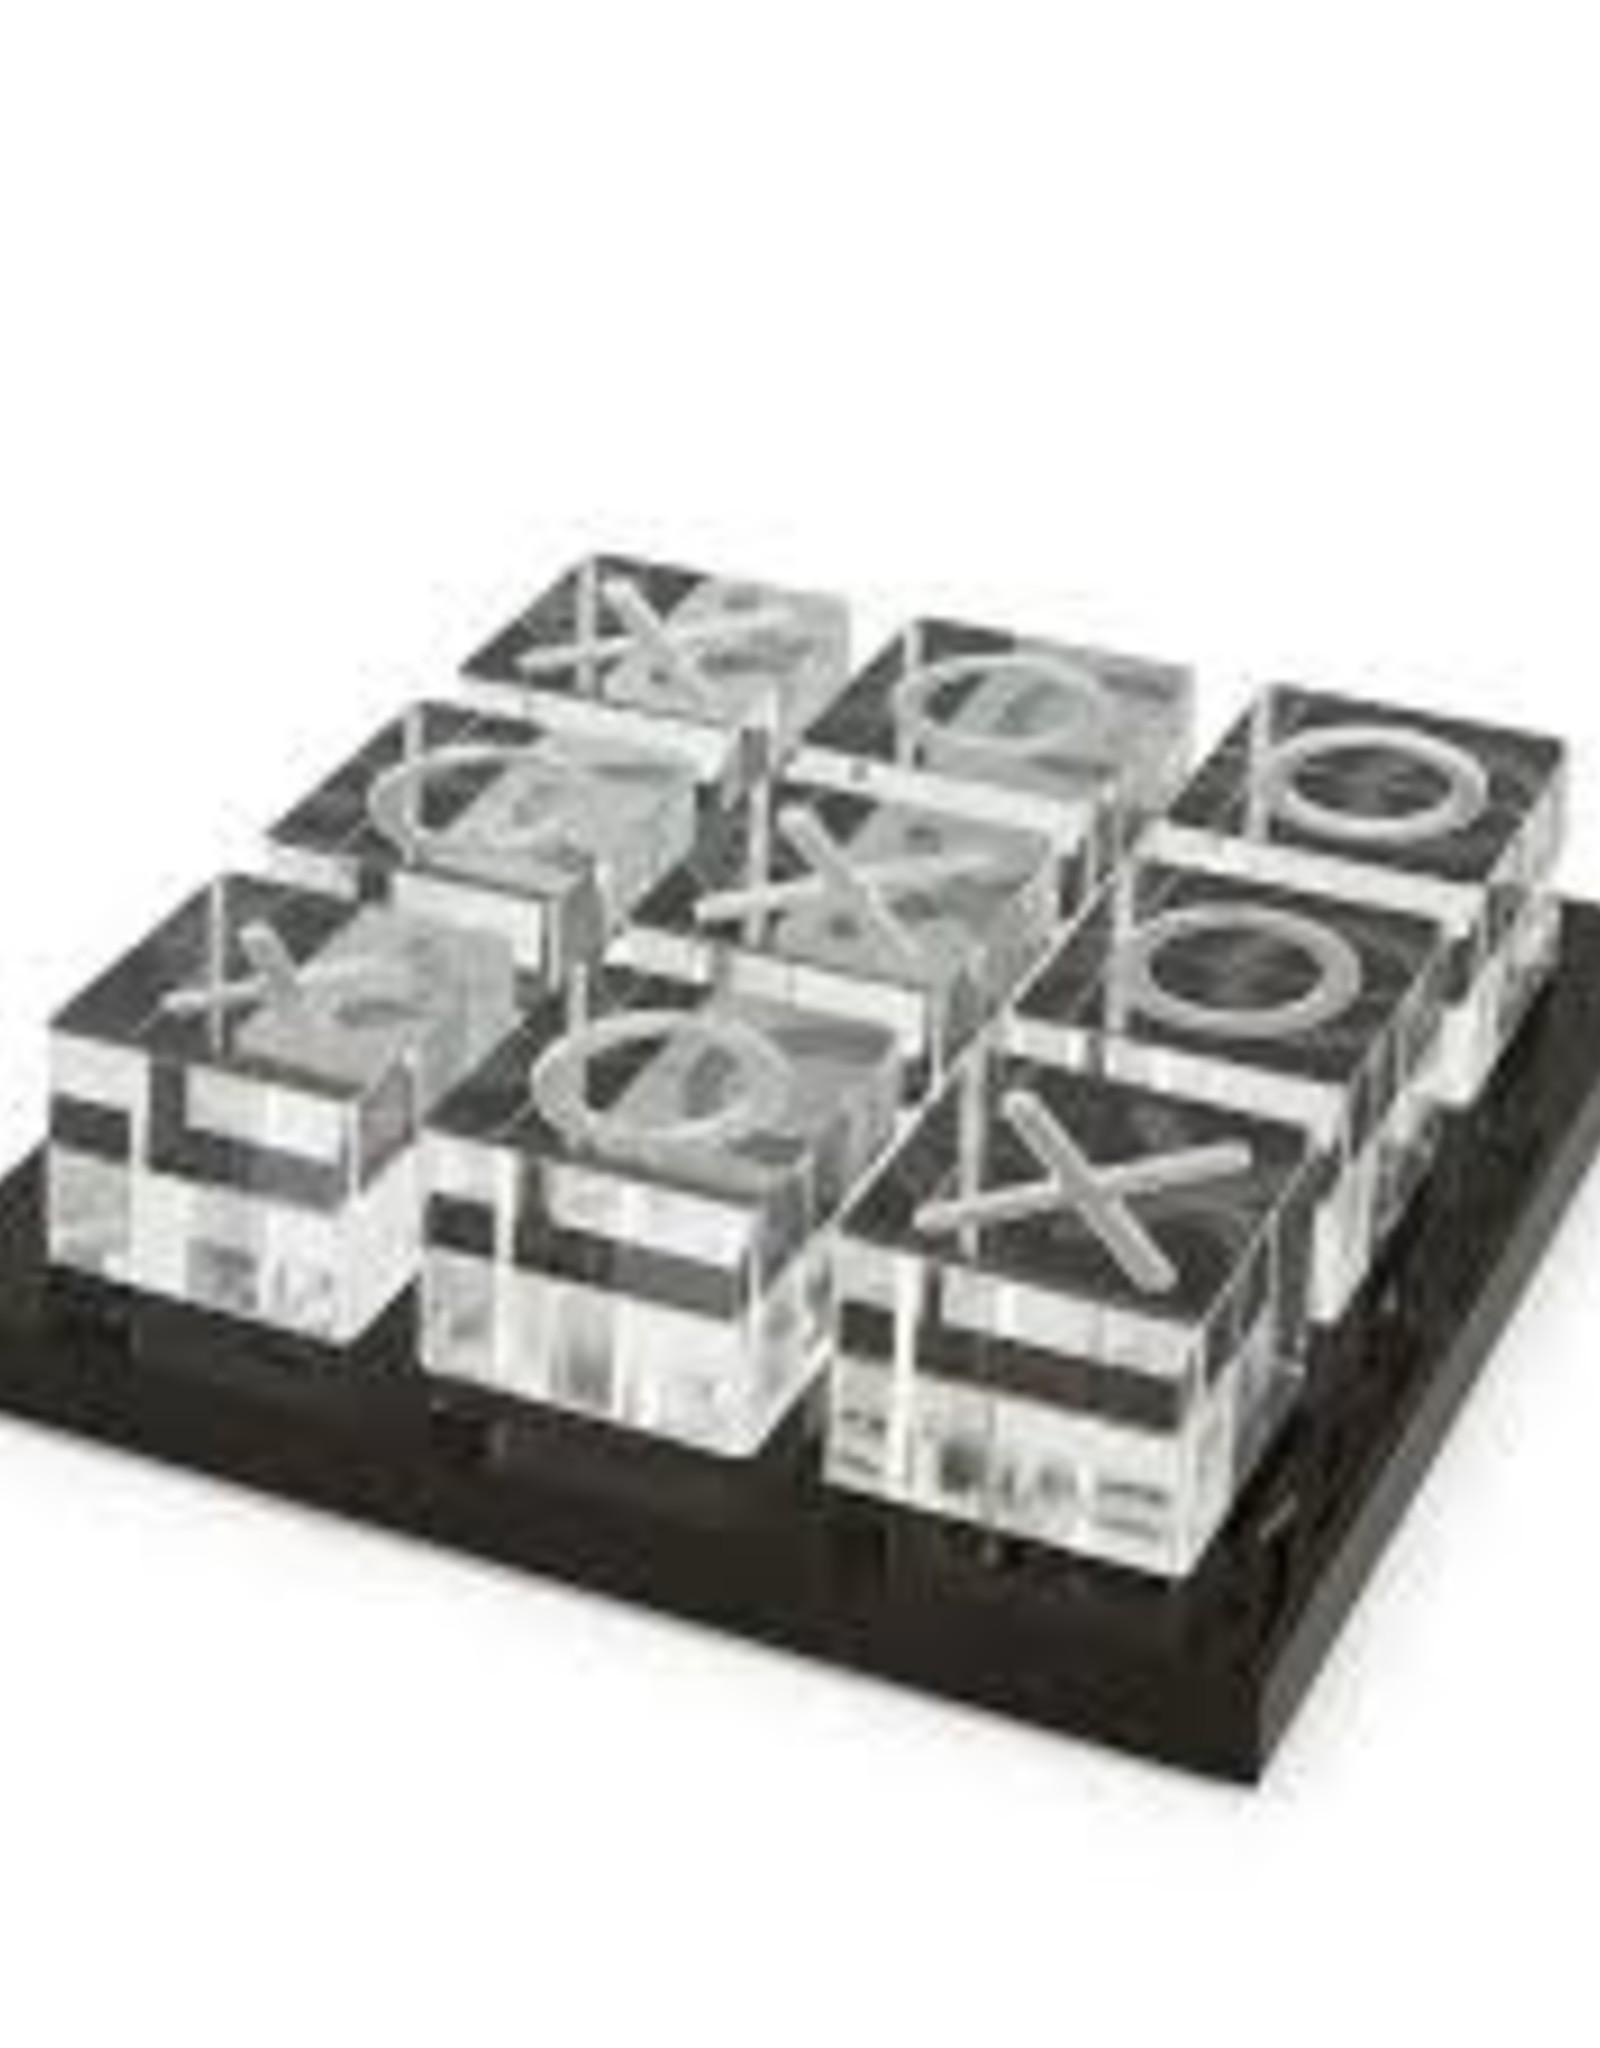 Tizo Design Acrylic Black/White Tic Tac Toe Board